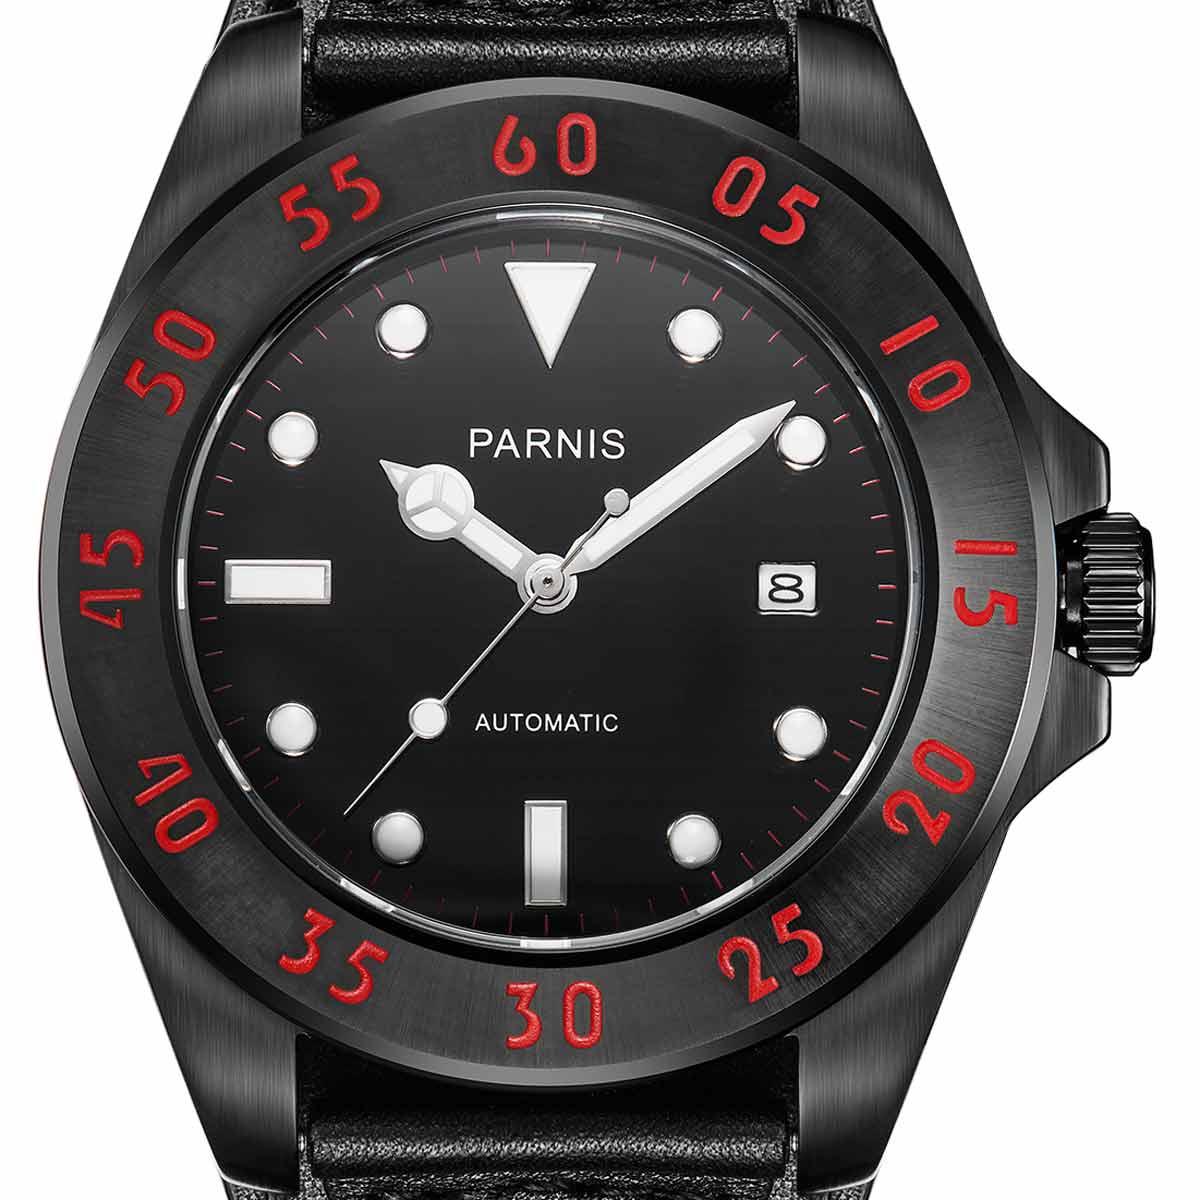 【NEW】PARNIS パーニス 自動巻き 腕時計 [PA6028-S3AL-BKrBK] 並行輸入品 純正ケース メーカー保証12ヶ月